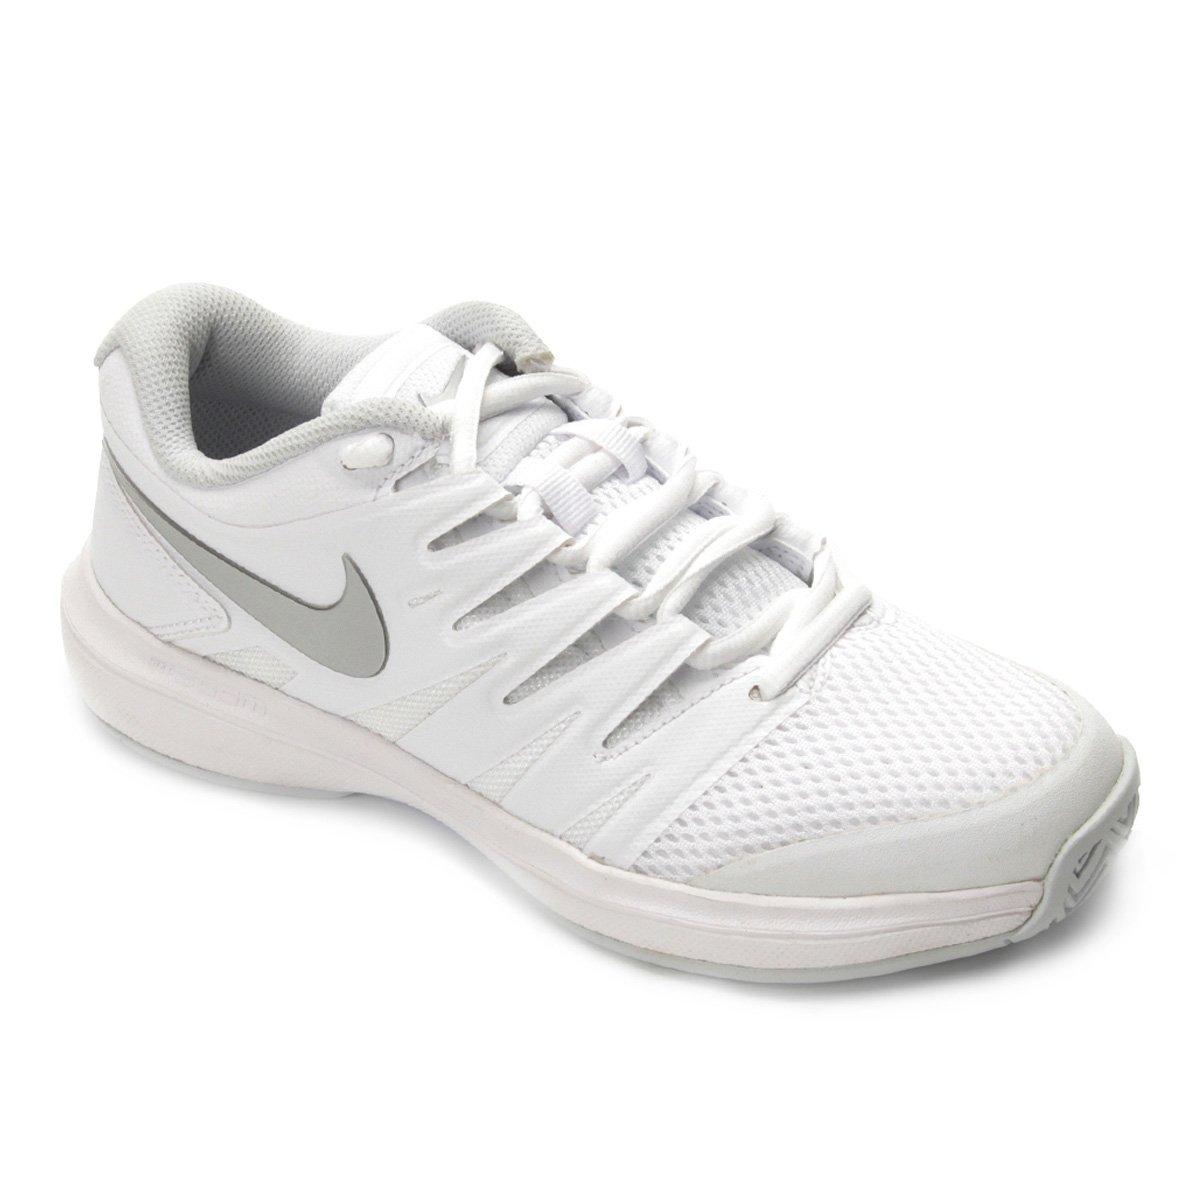 Tênis Nike Air Zoom Prestige Hc Feminino Branco E Prata